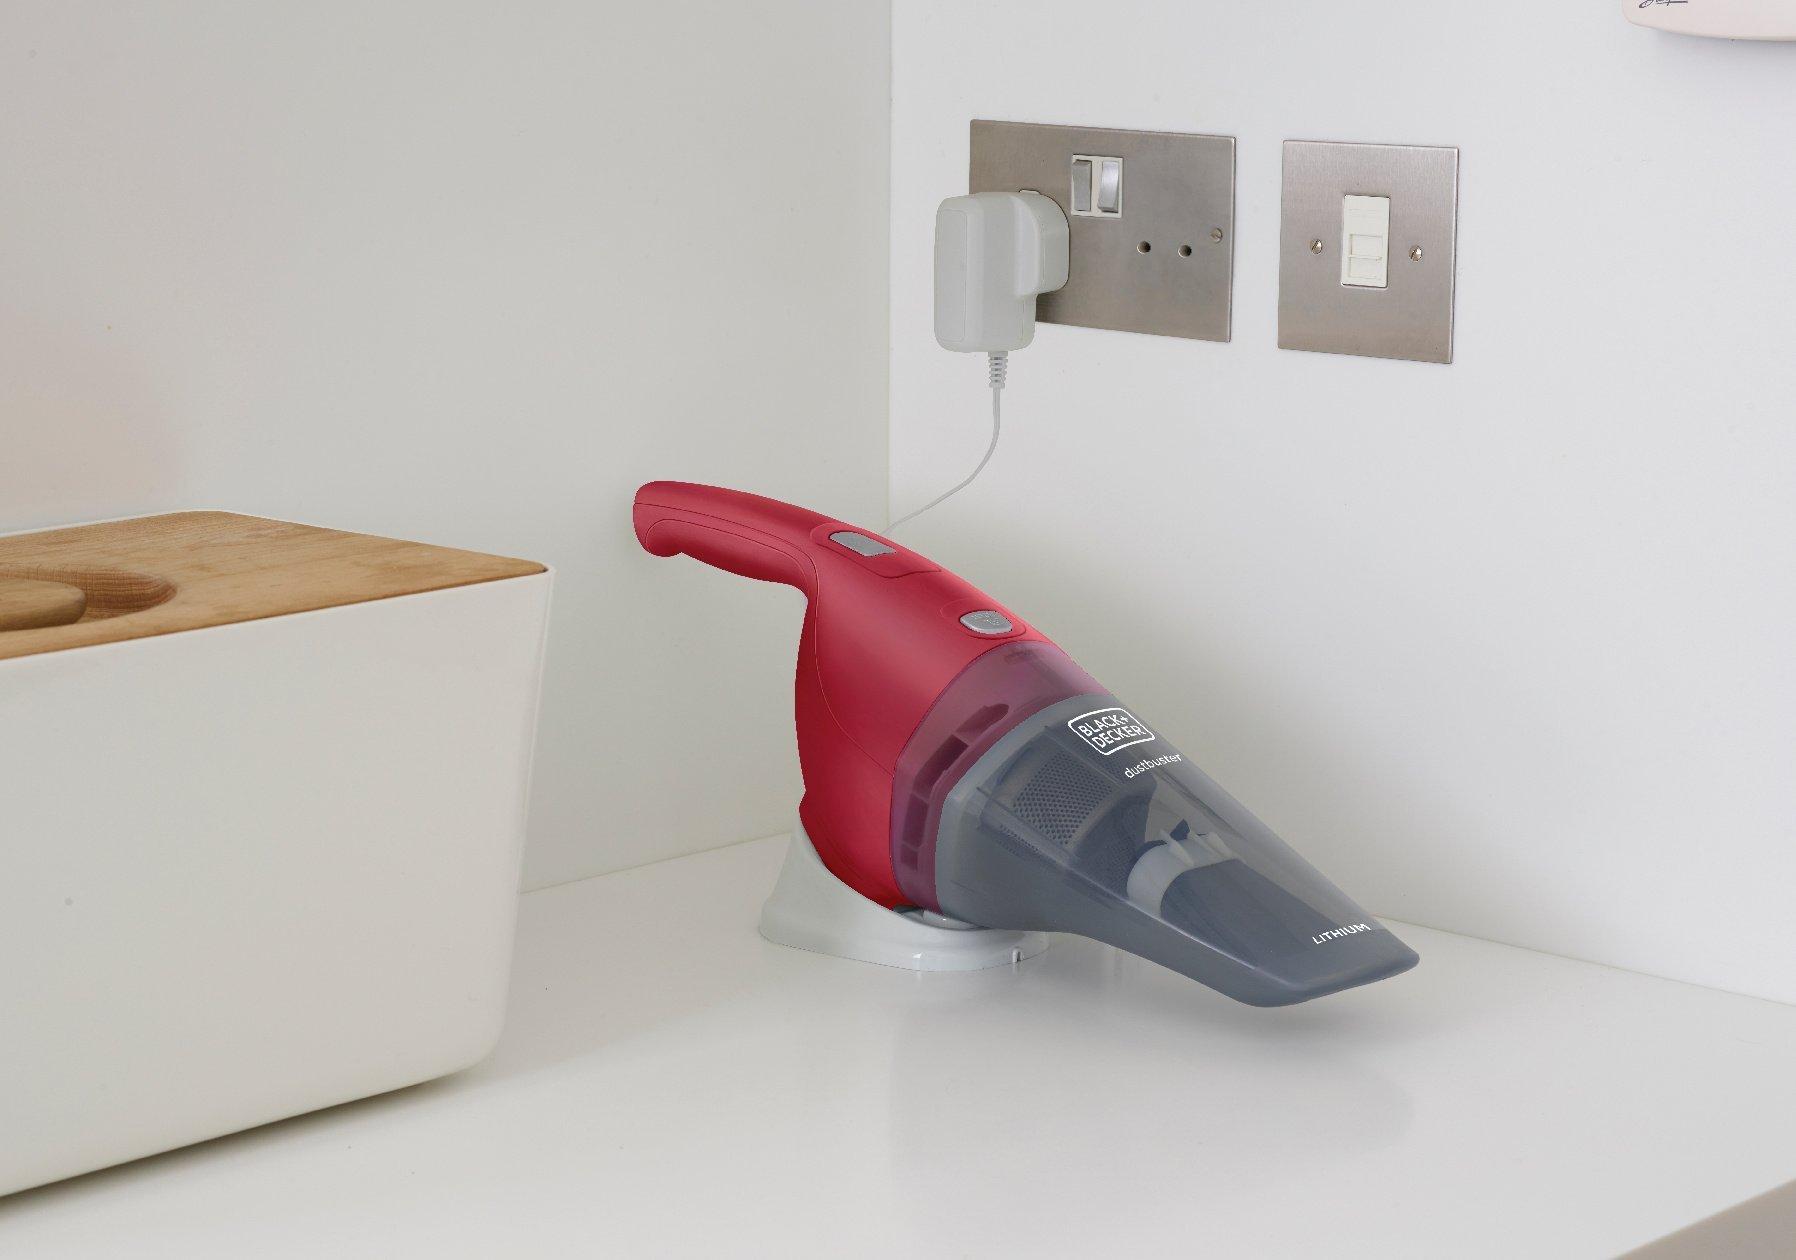 Black+Decker NVB-115-WA Aspirador de mano ciclónico inalámbrico, 7.5 W, 0.37 litros, 70 Decibeles, Rosa: Amazon.es: Hogar